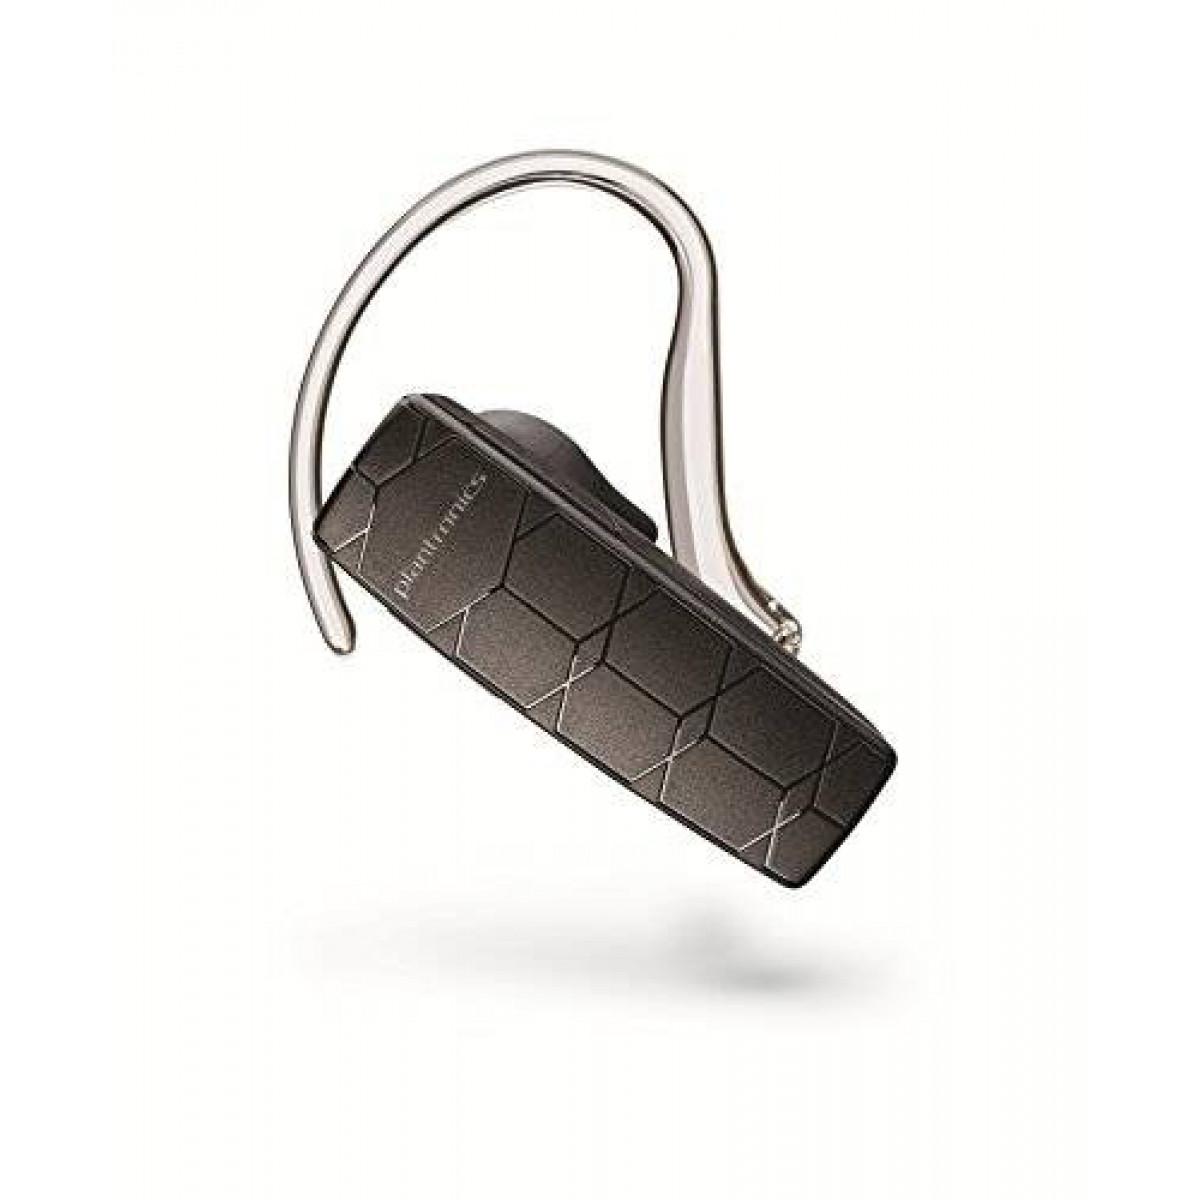 Plantronics Explorer 50 Wireless Bluetooth Headset - Retail Packaging - Black